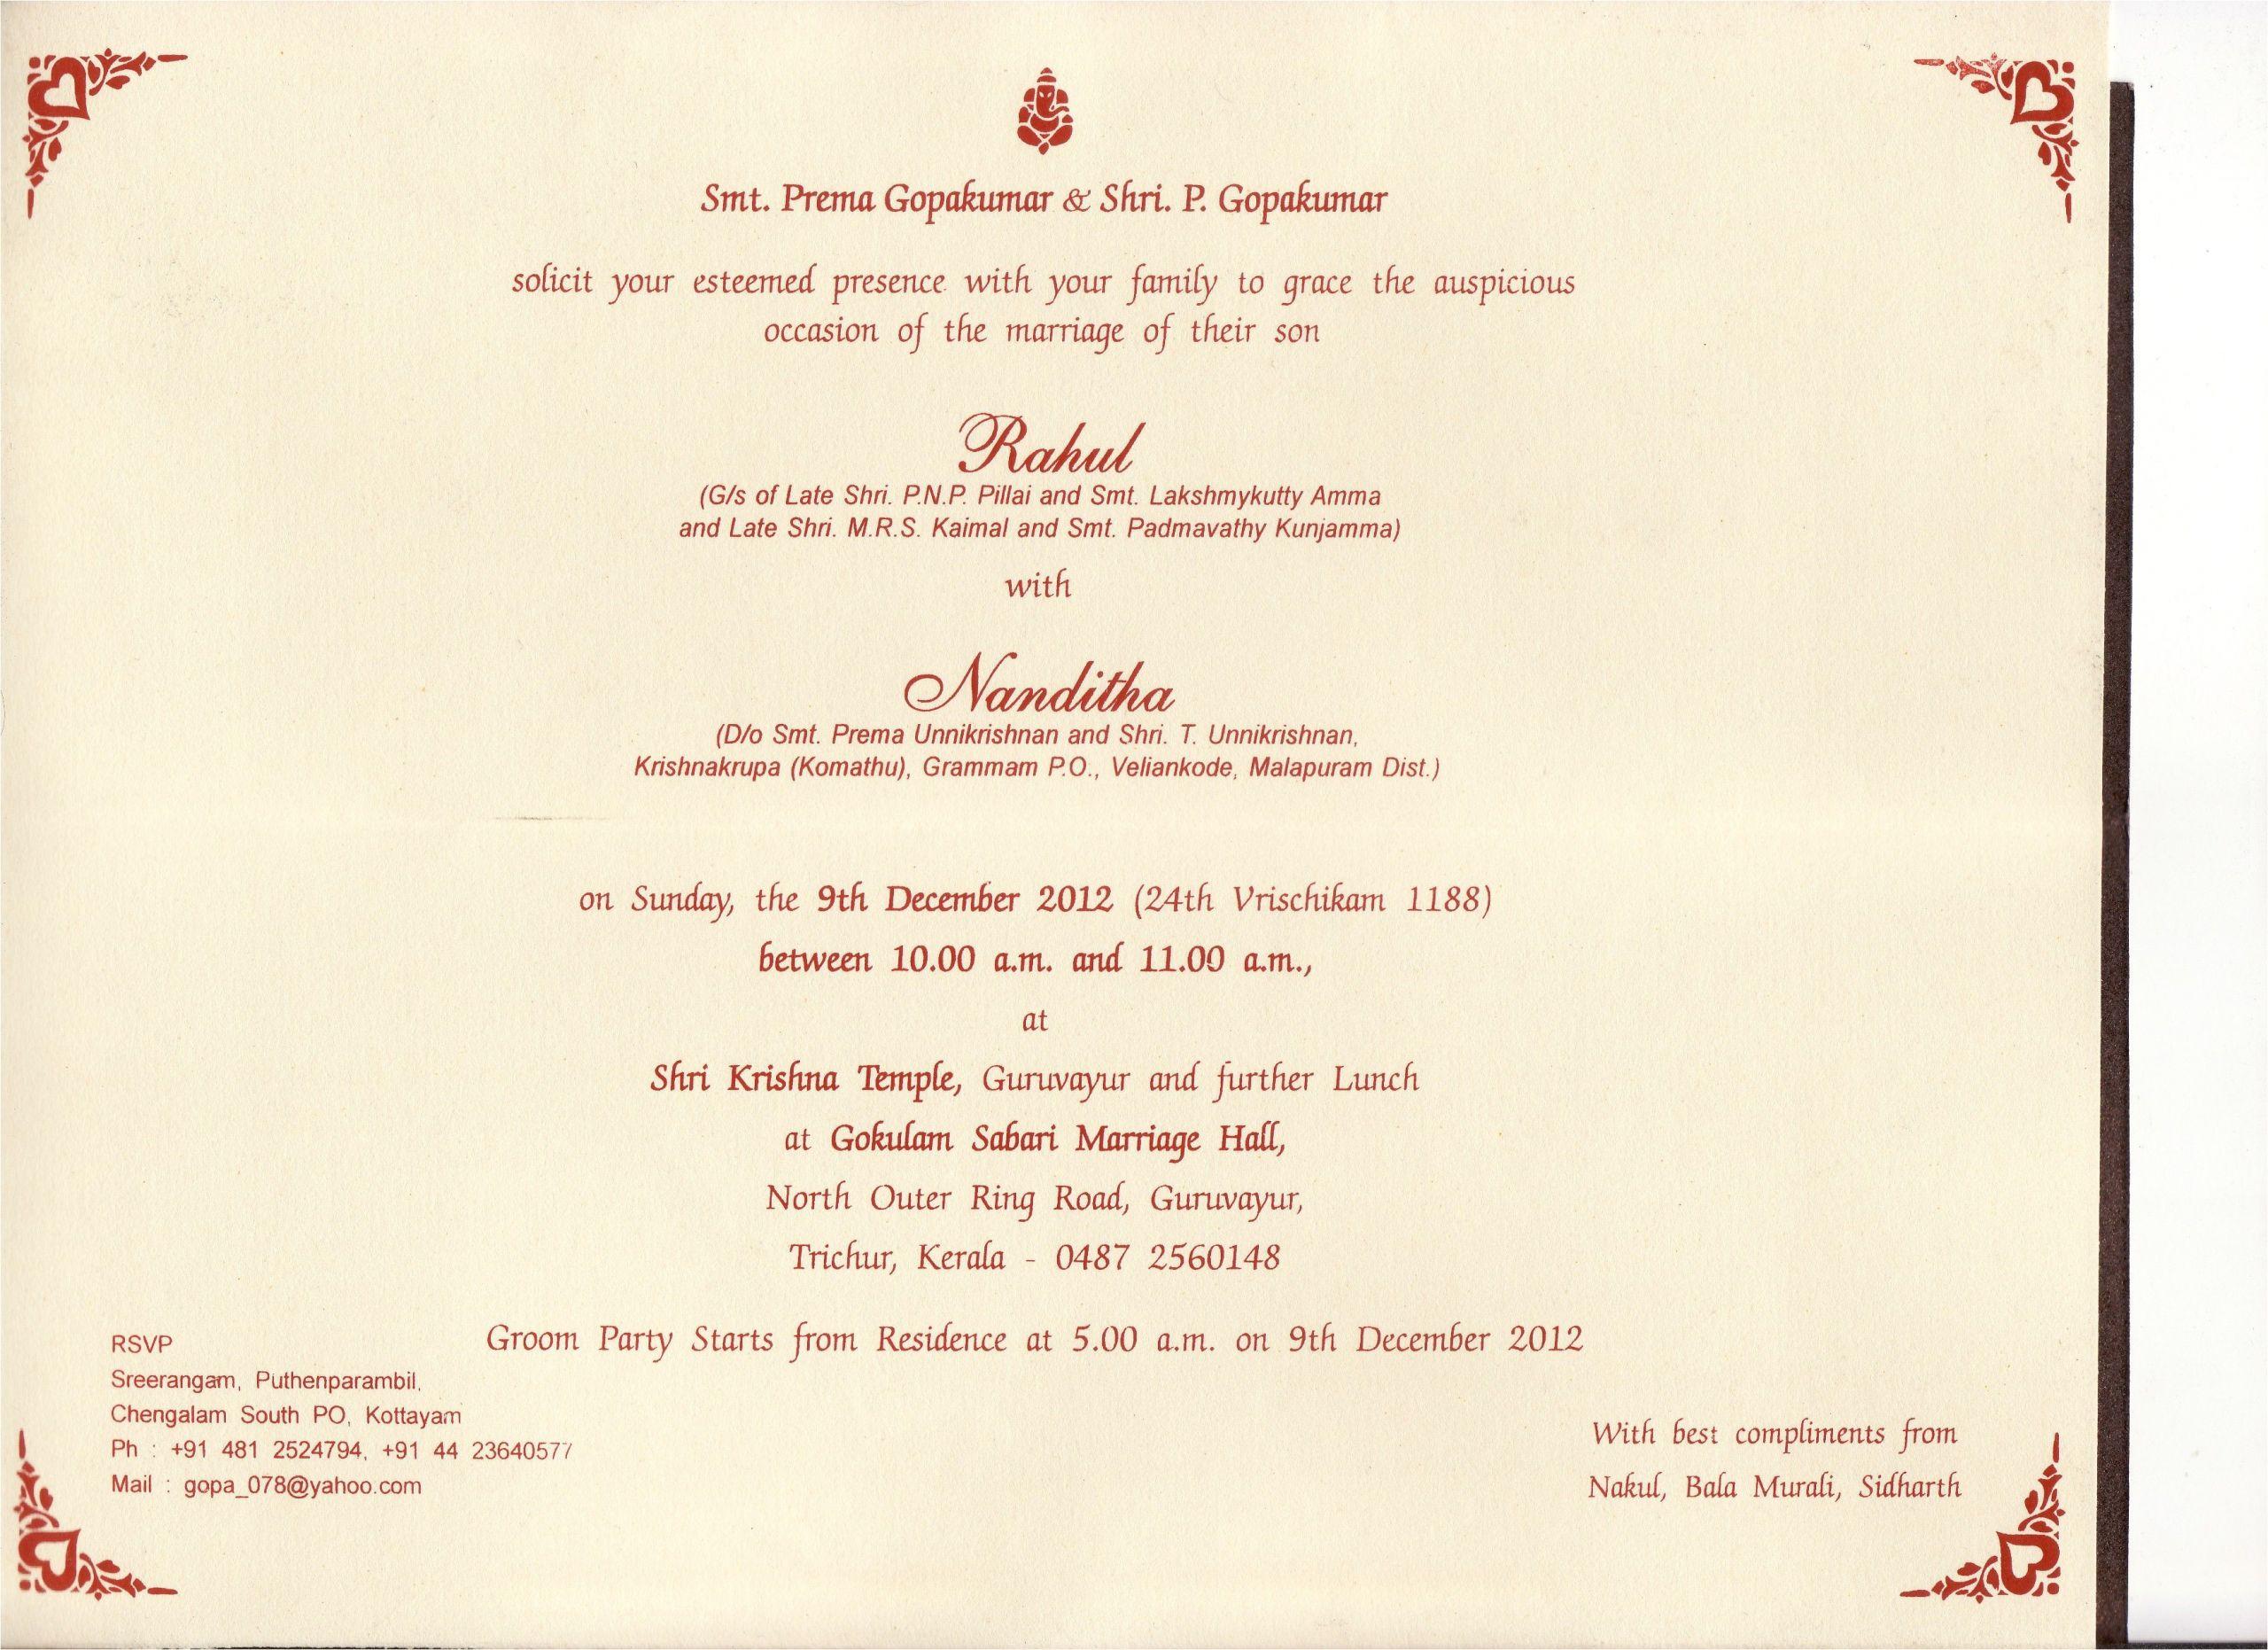 Kerala Hindu Wedding Card Matter In Malayalam Kerala Christian Wedding Invitation Cards Wordings Cobypic Com